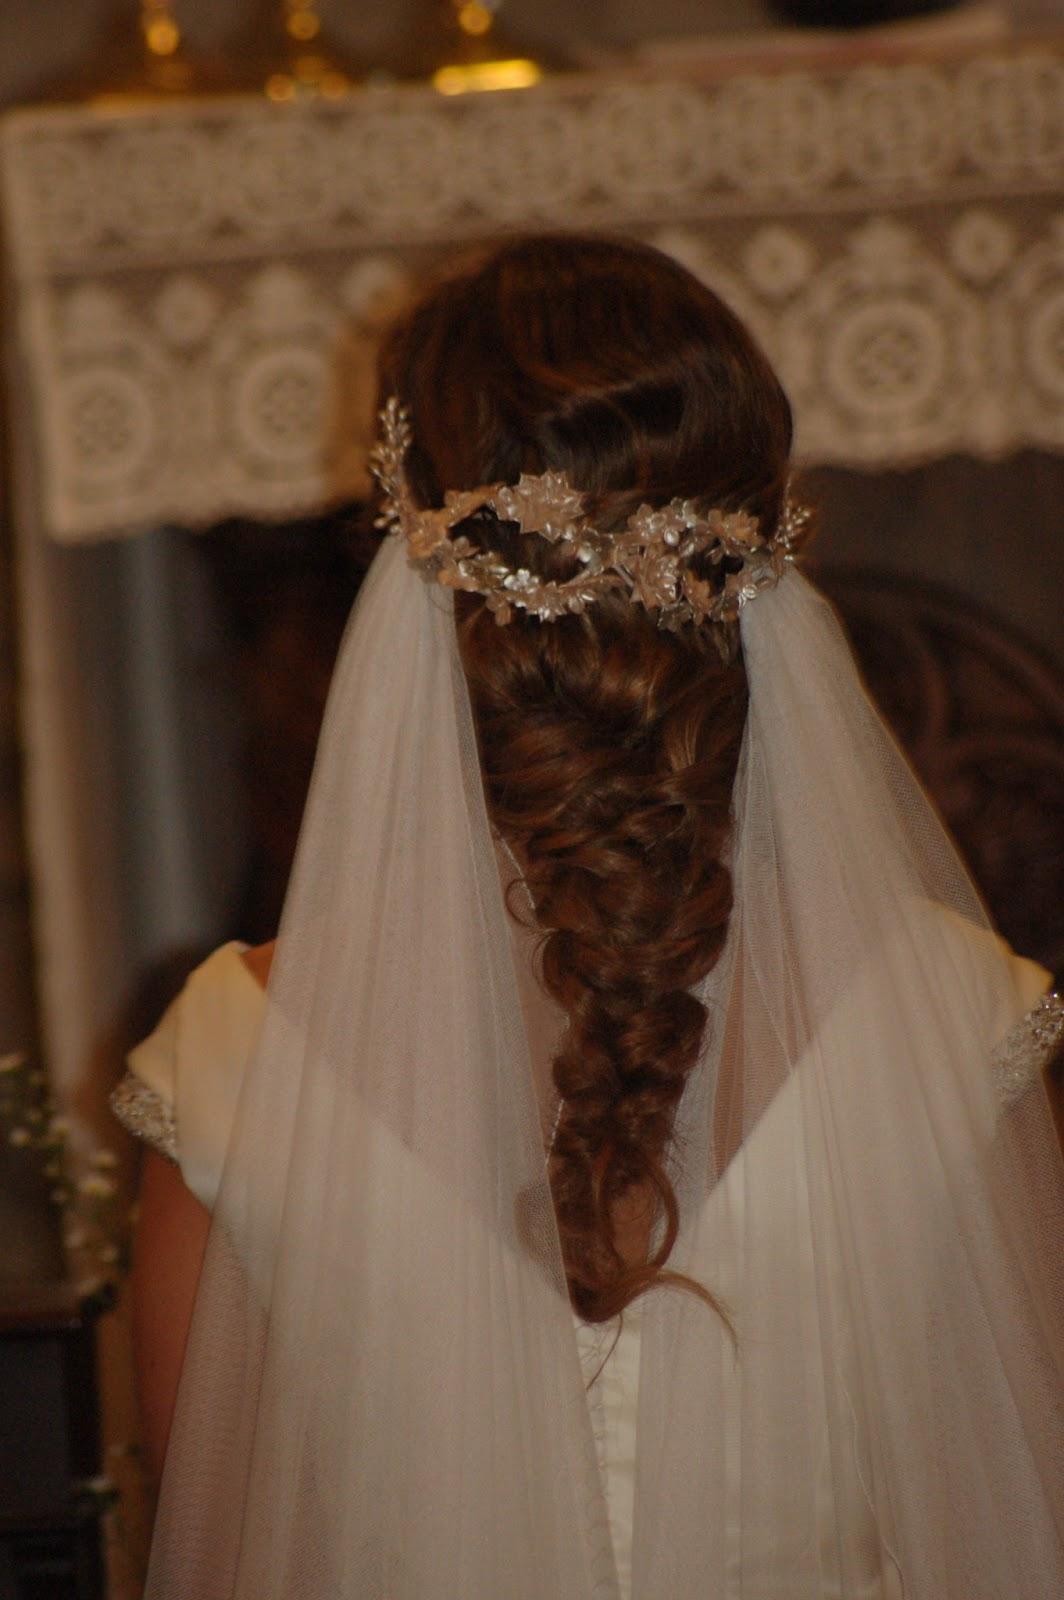 La vie est belle detalles de una boda perfecta - Detalles para una boda perfecta ...